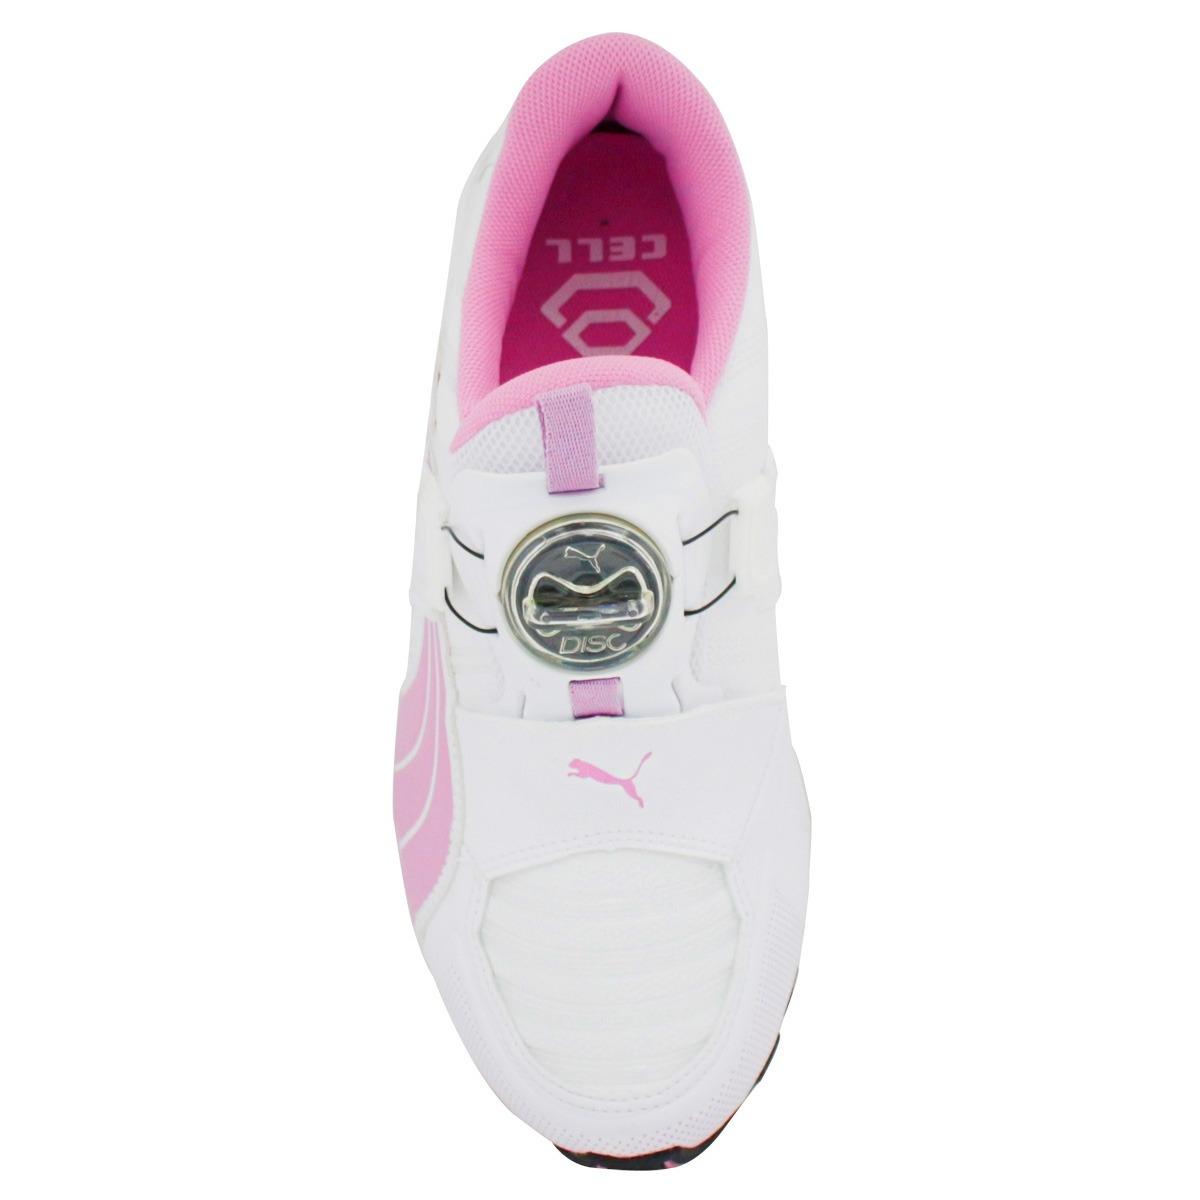 puma disc feminino branco e rosa